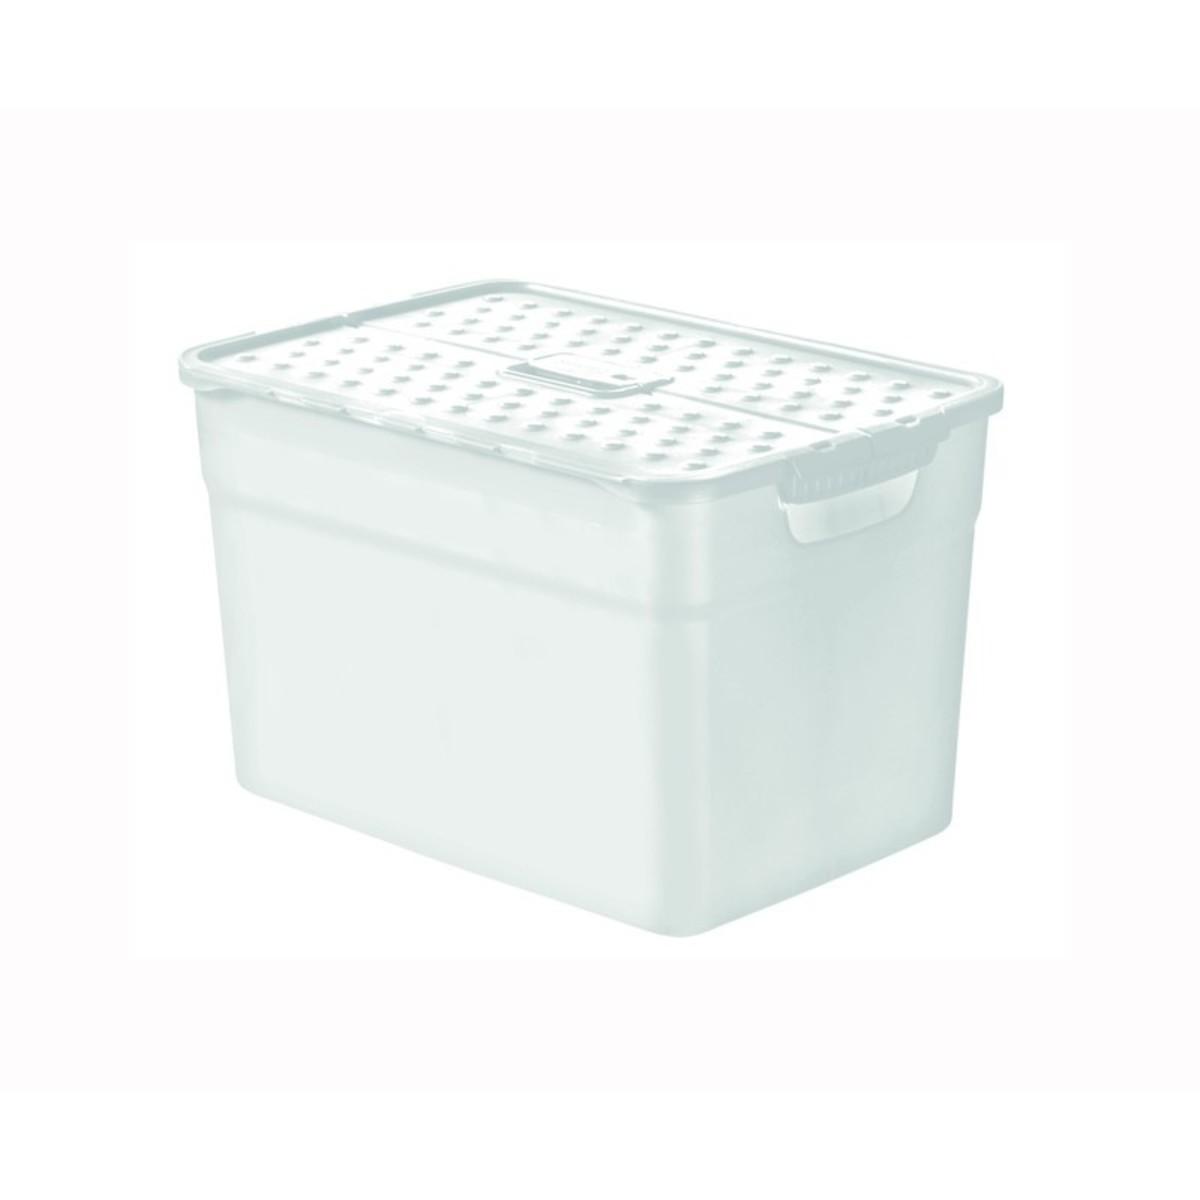 Контейнер Curver Pixxel прозрачный 12 л